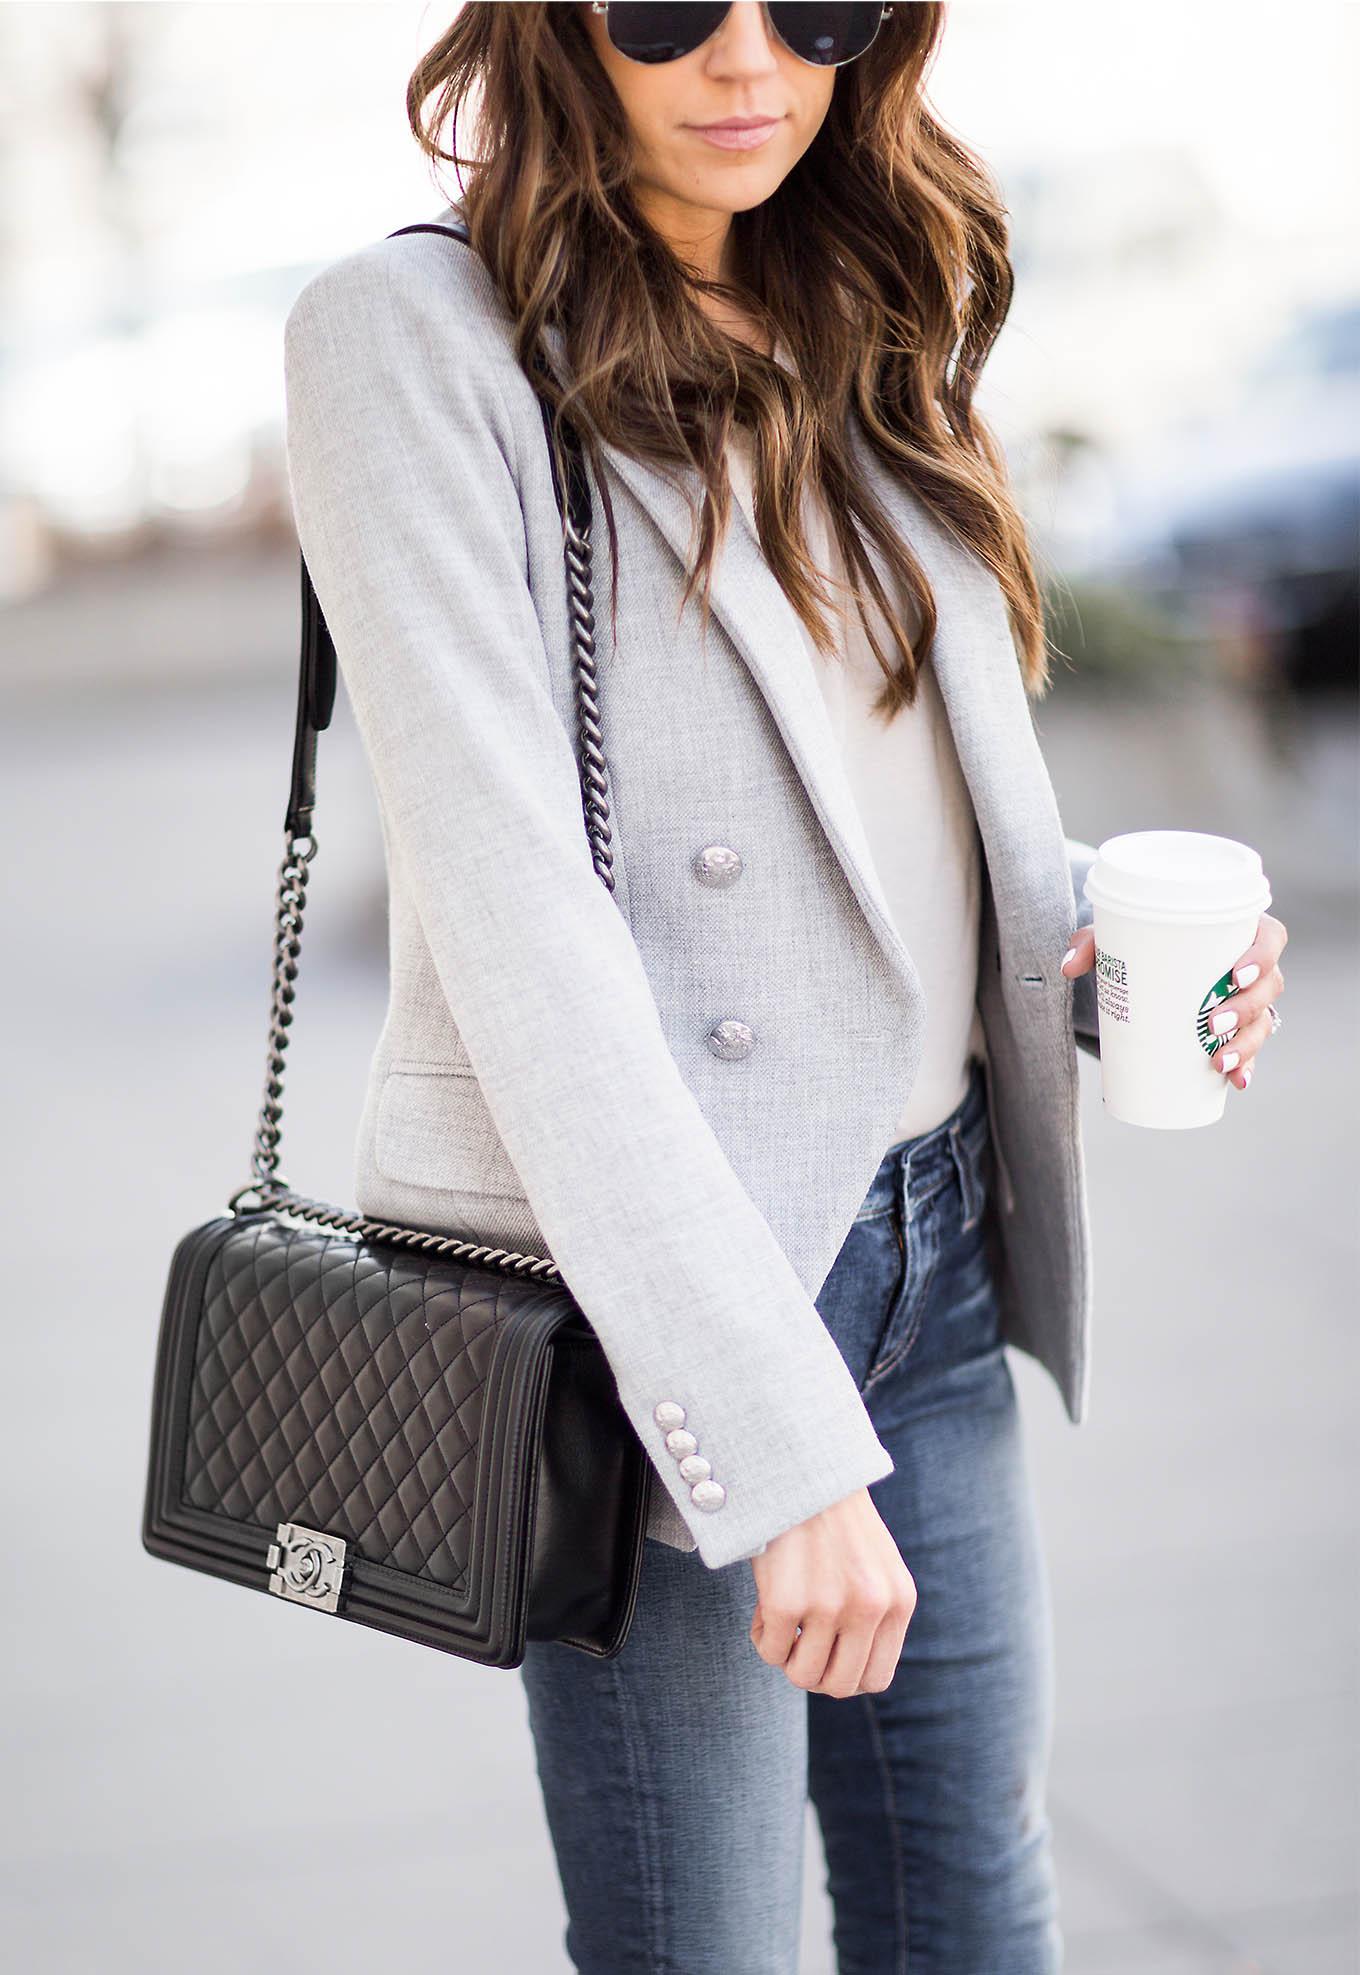 Chanel Crossbody Bag